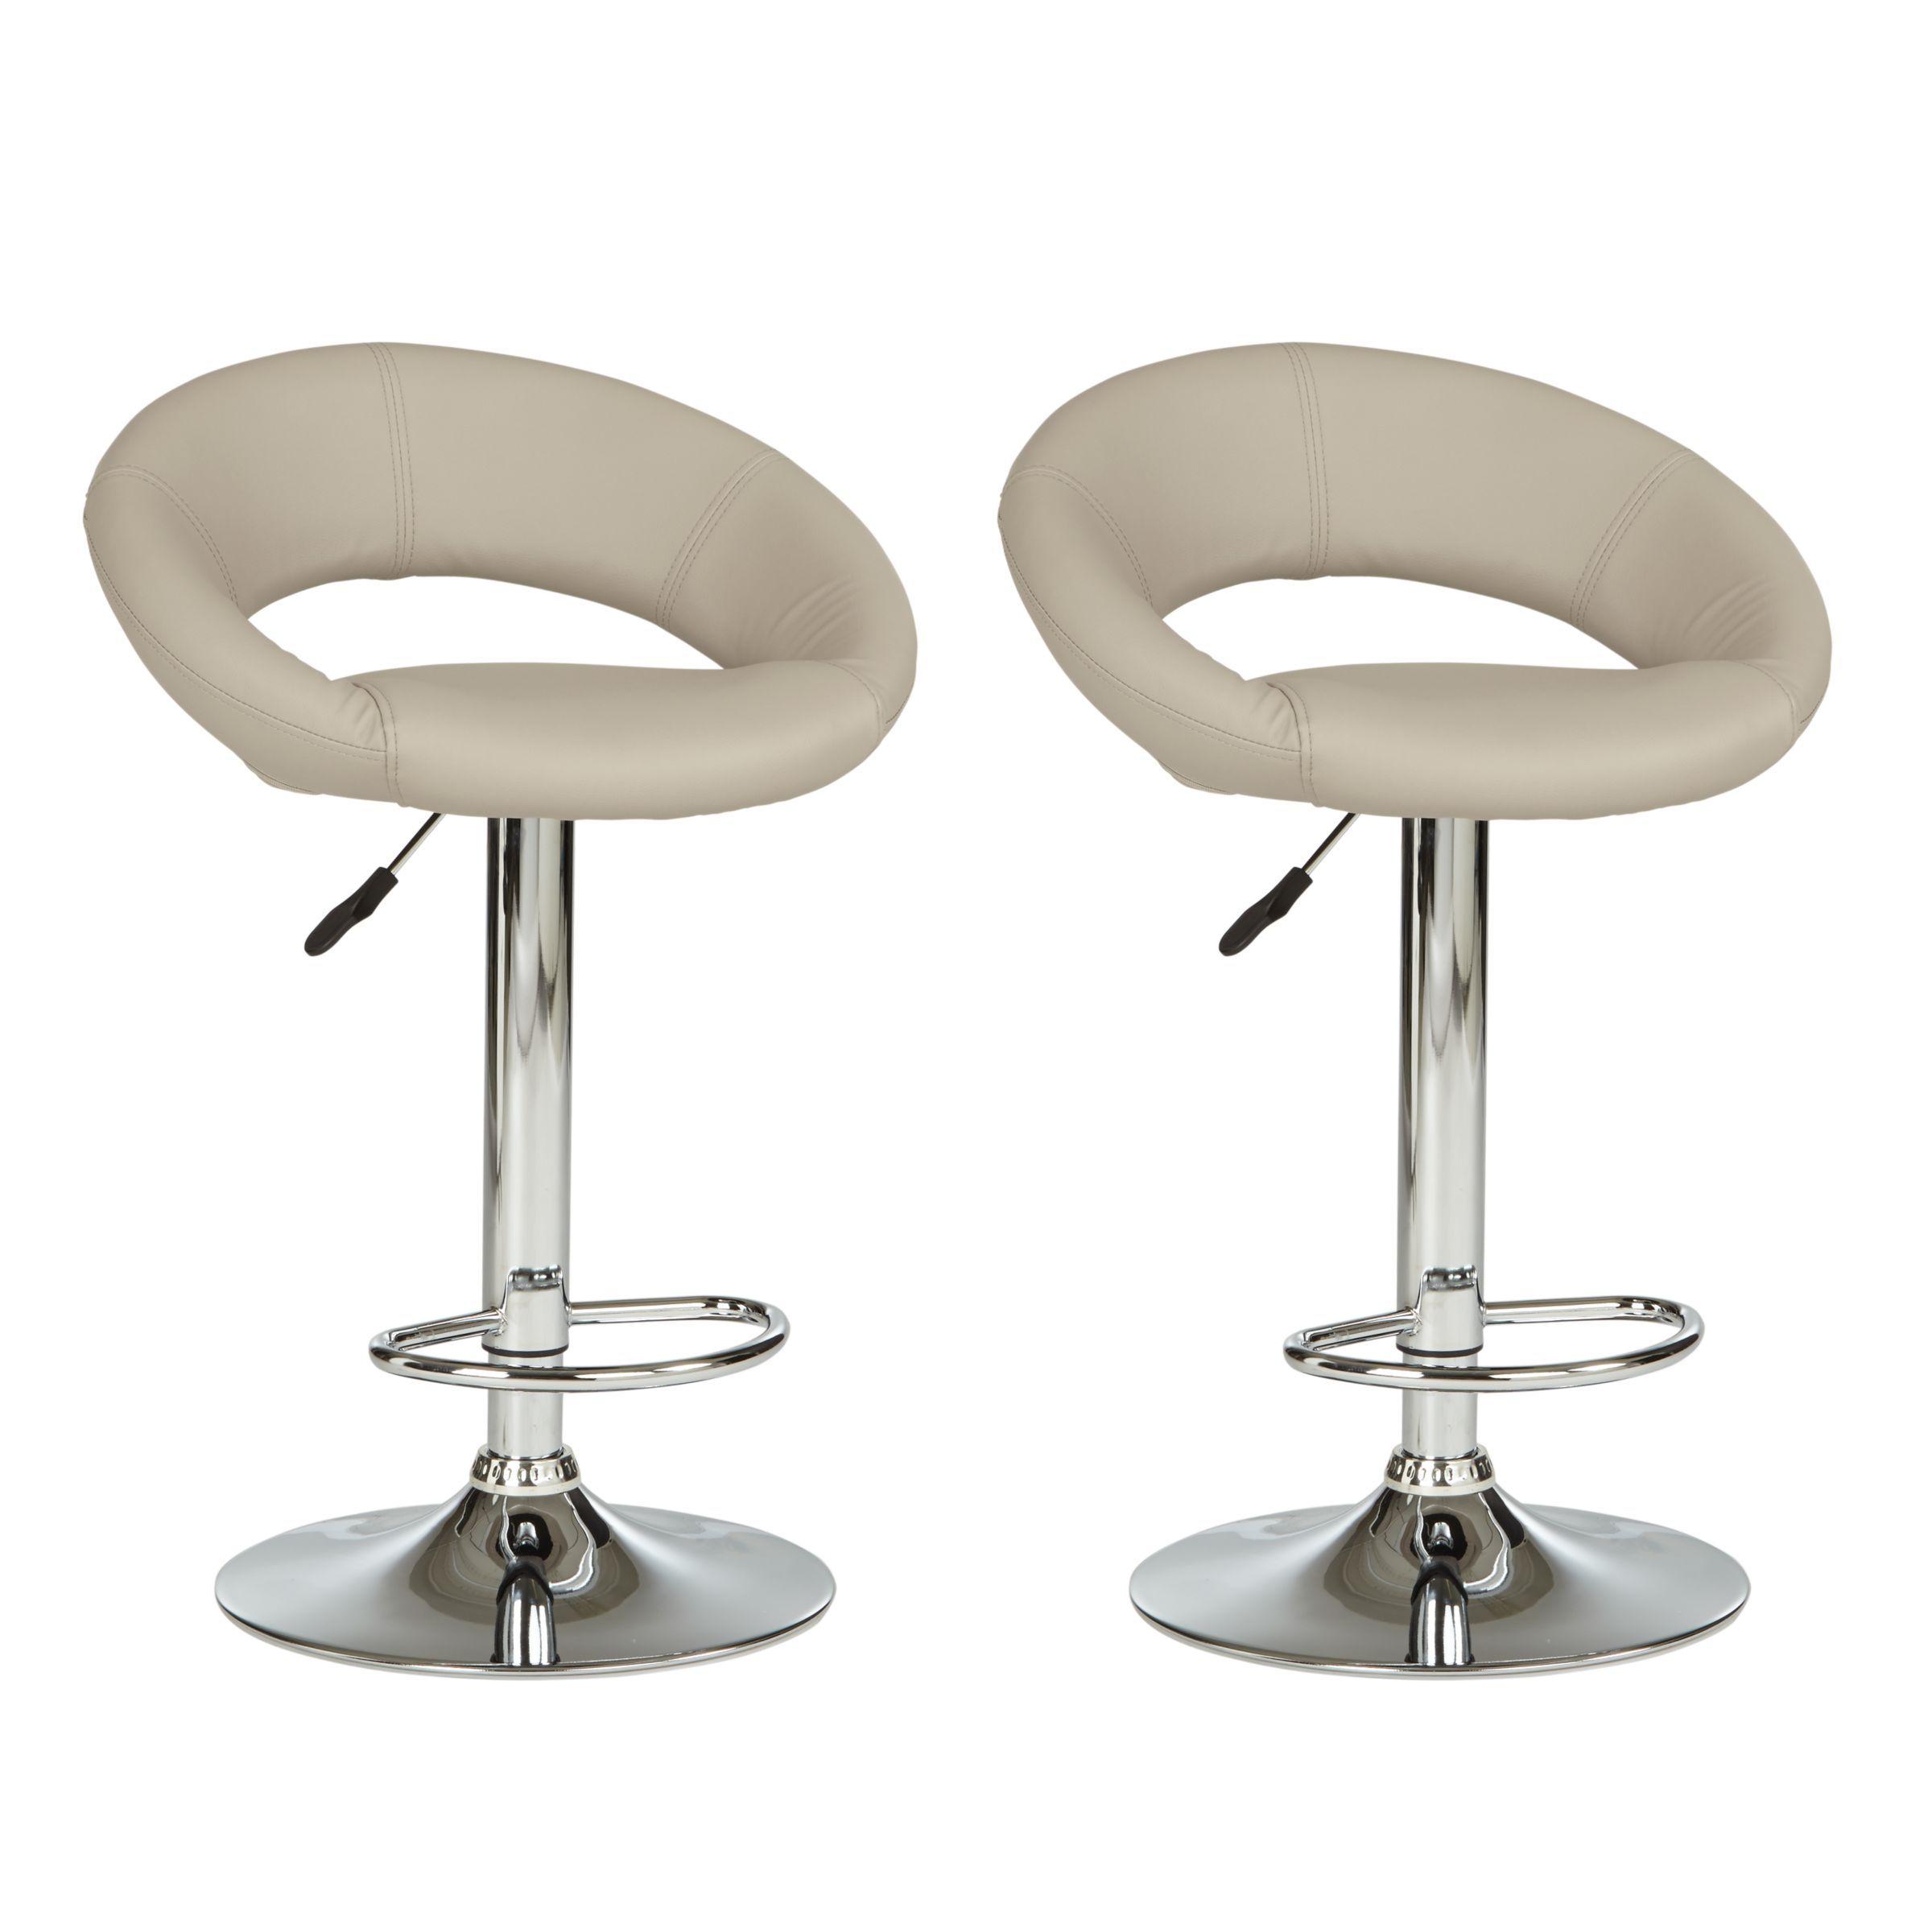 john lewis  partners oliver bar stools set of 2 taupe